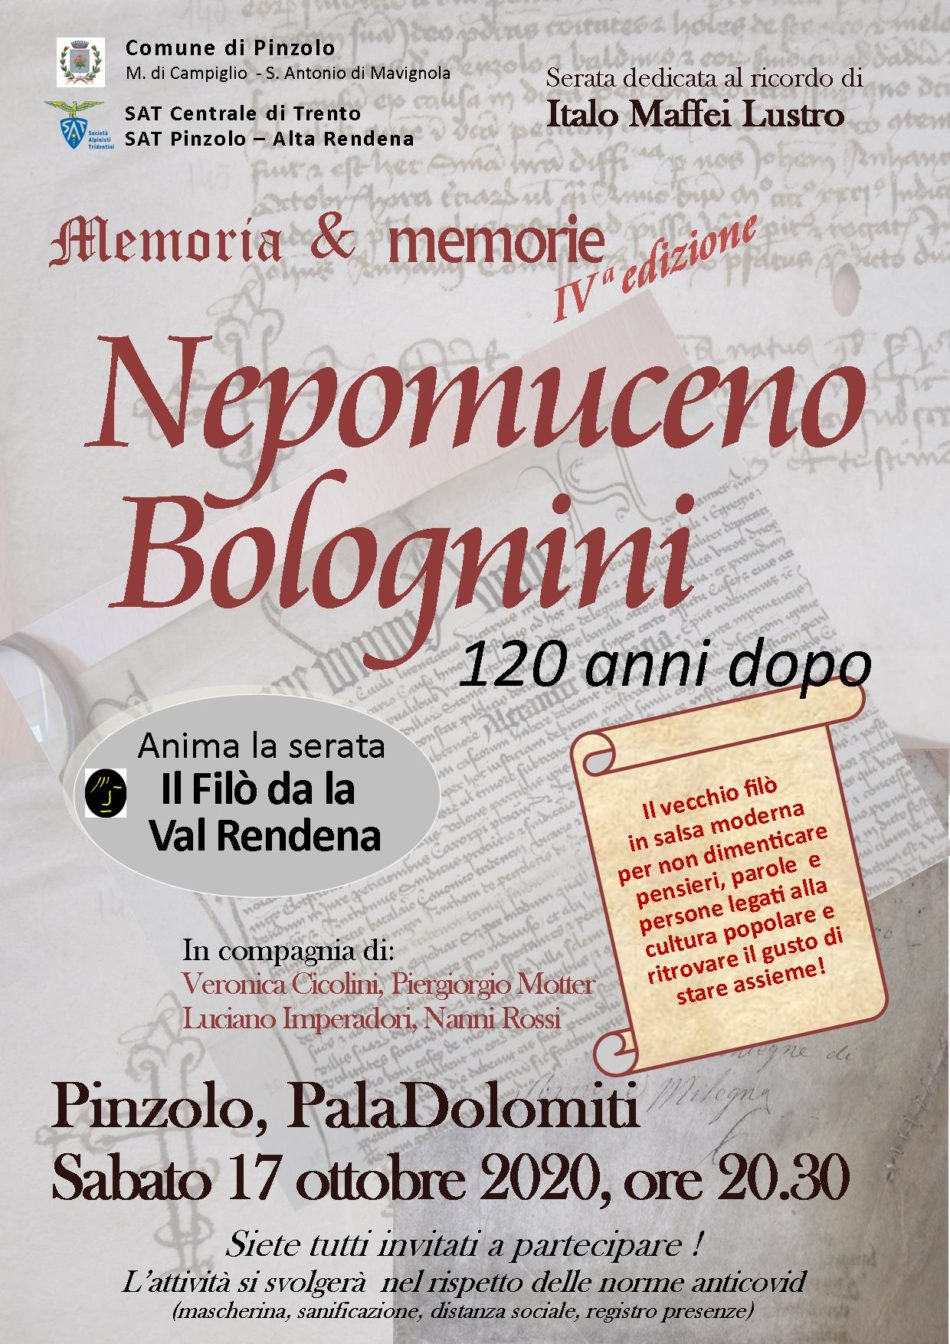 Memoria & Memorie: Nepomuceno Bolognini